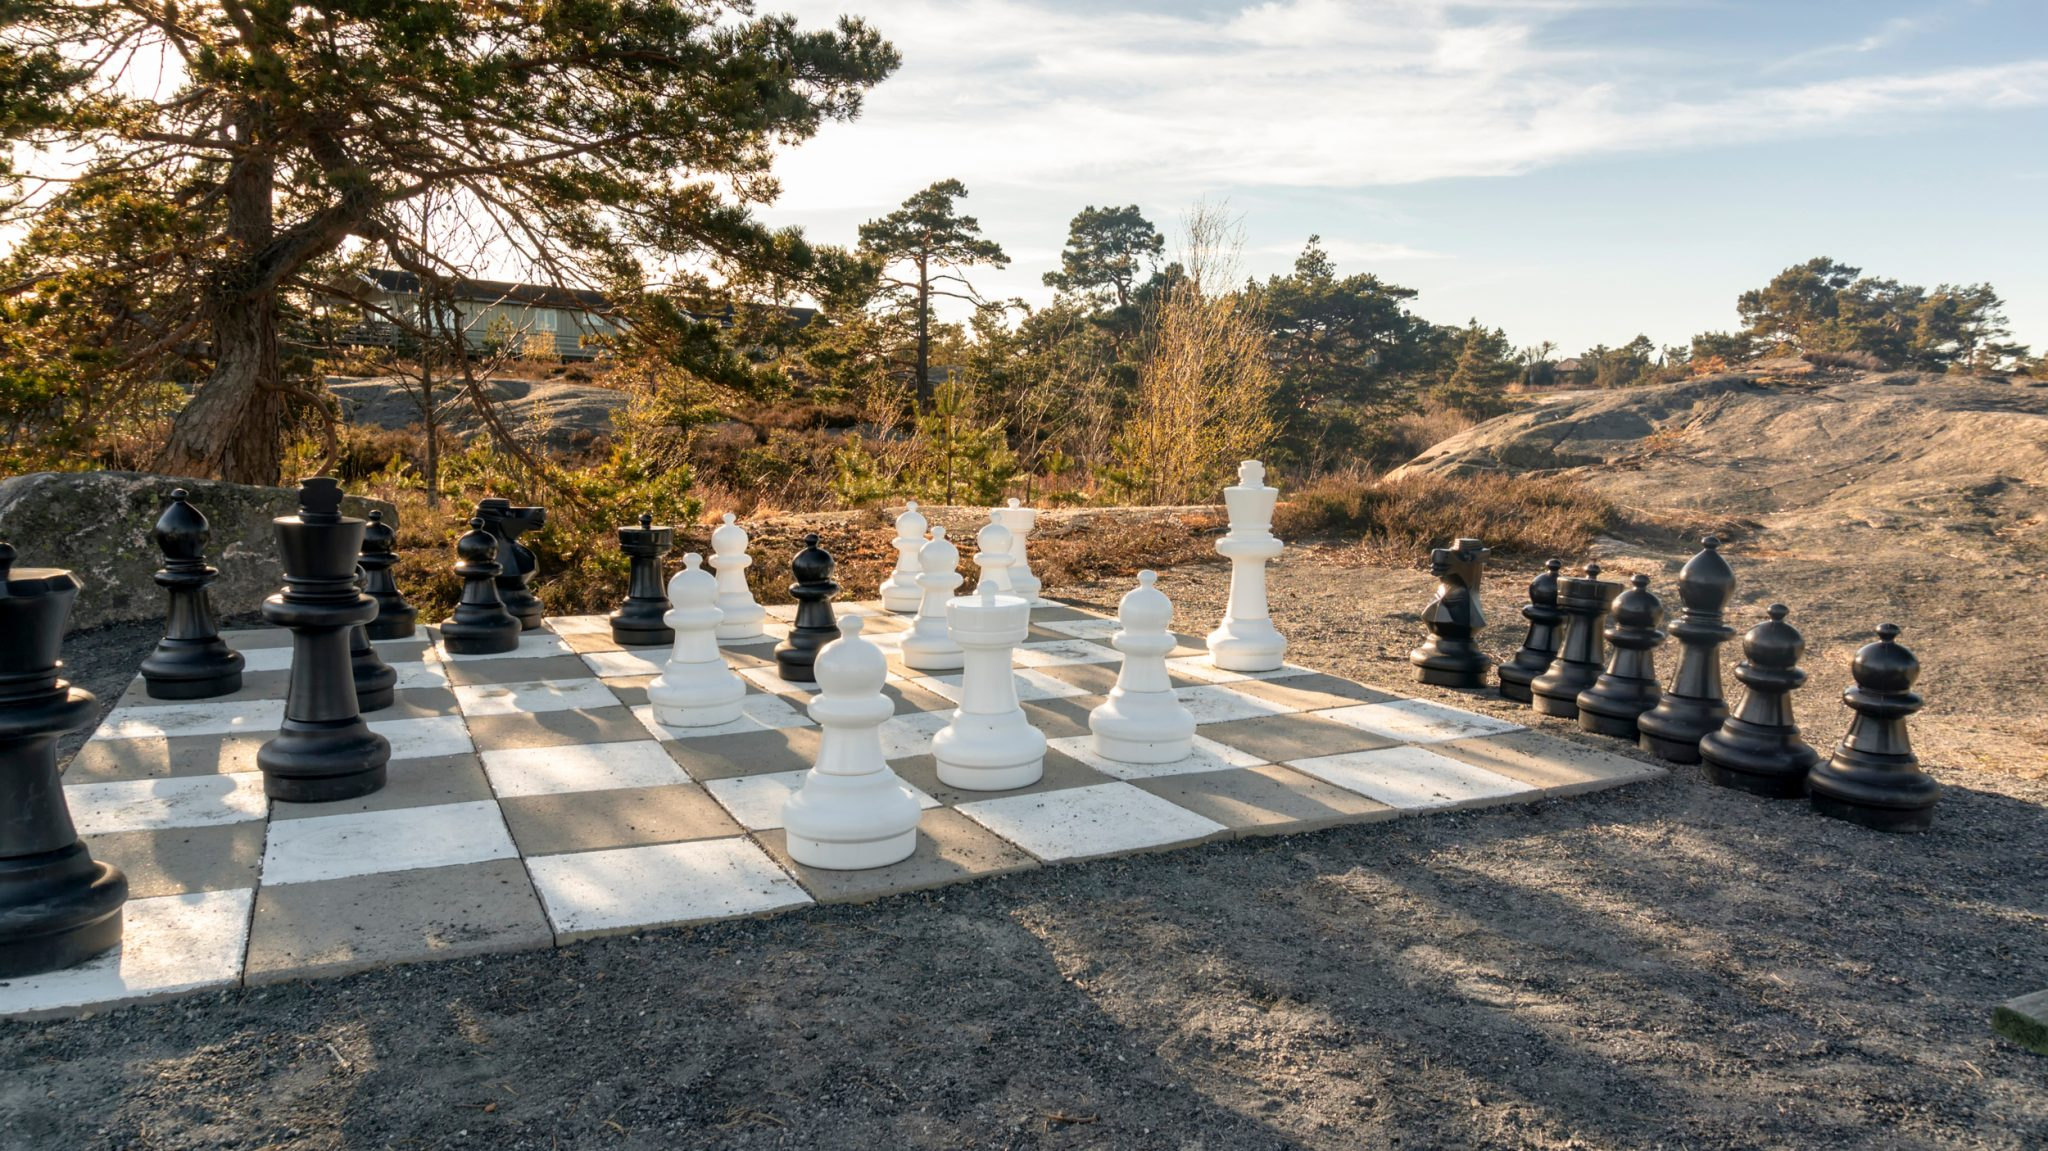 hardscape ideas chessboard